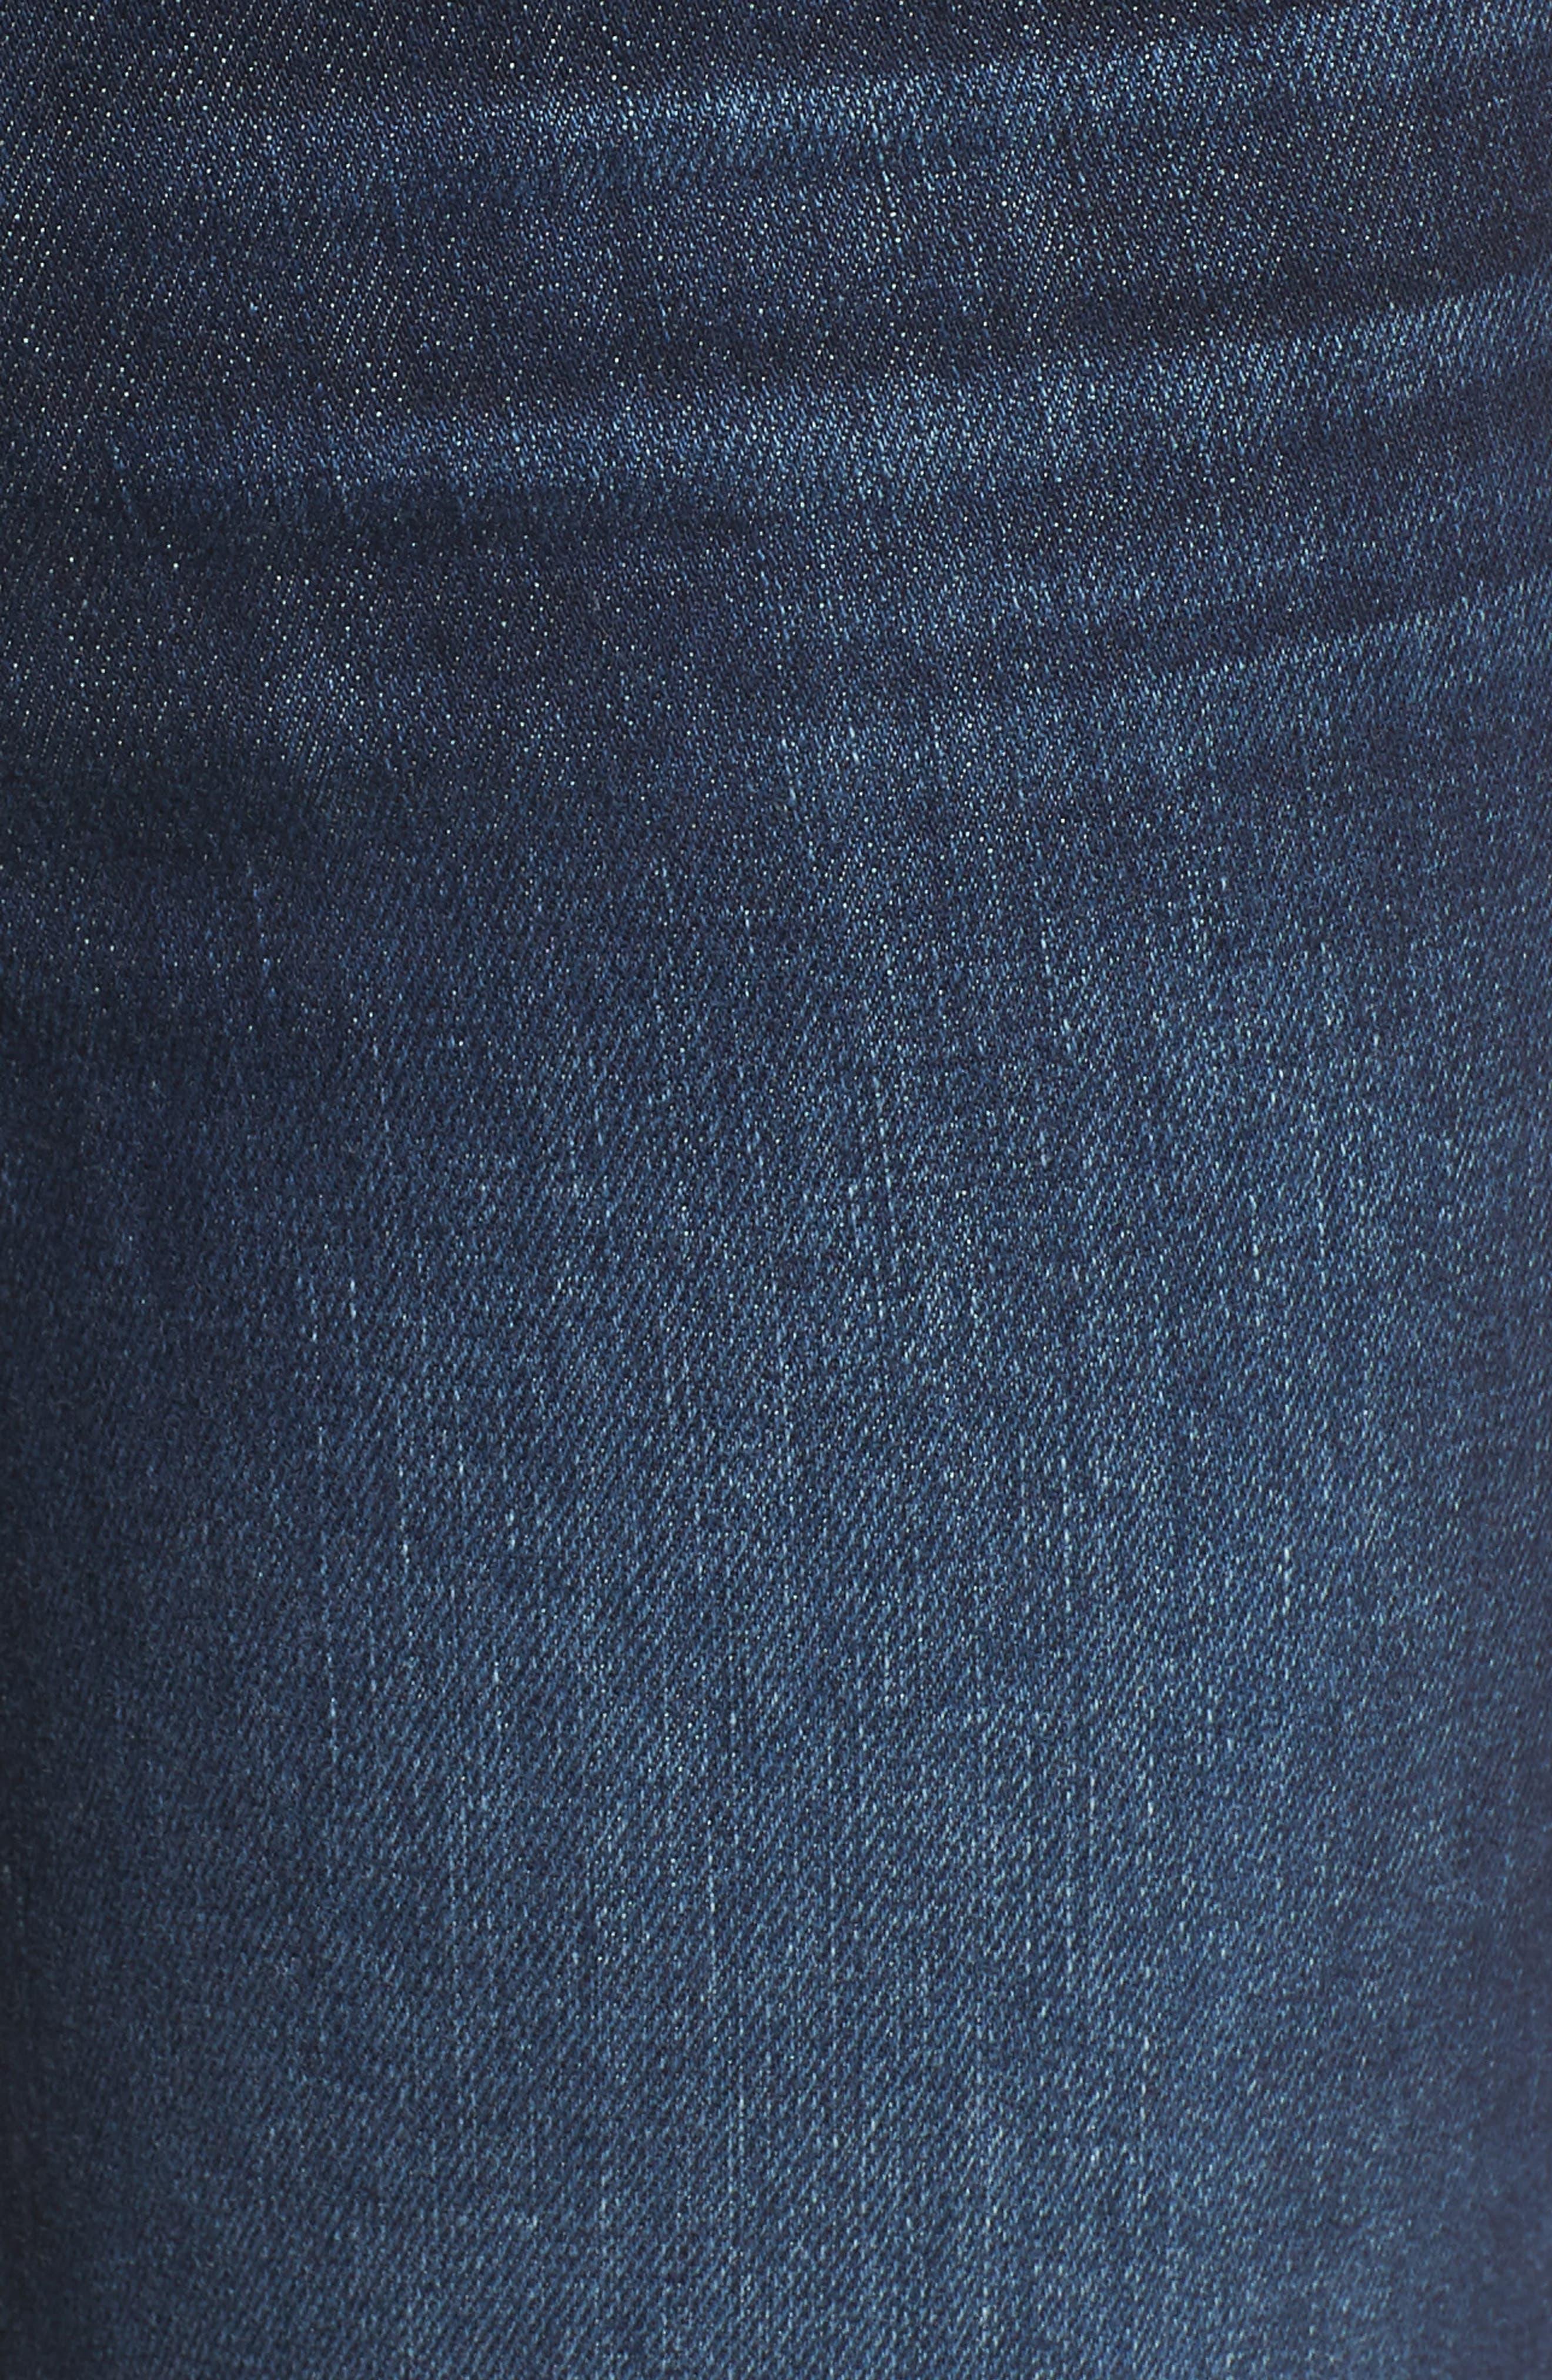 Hoxton Transcend Vintage High Waist Crop Straight Leg Jeans,                             Alternate thumbnail 5, color,                             400